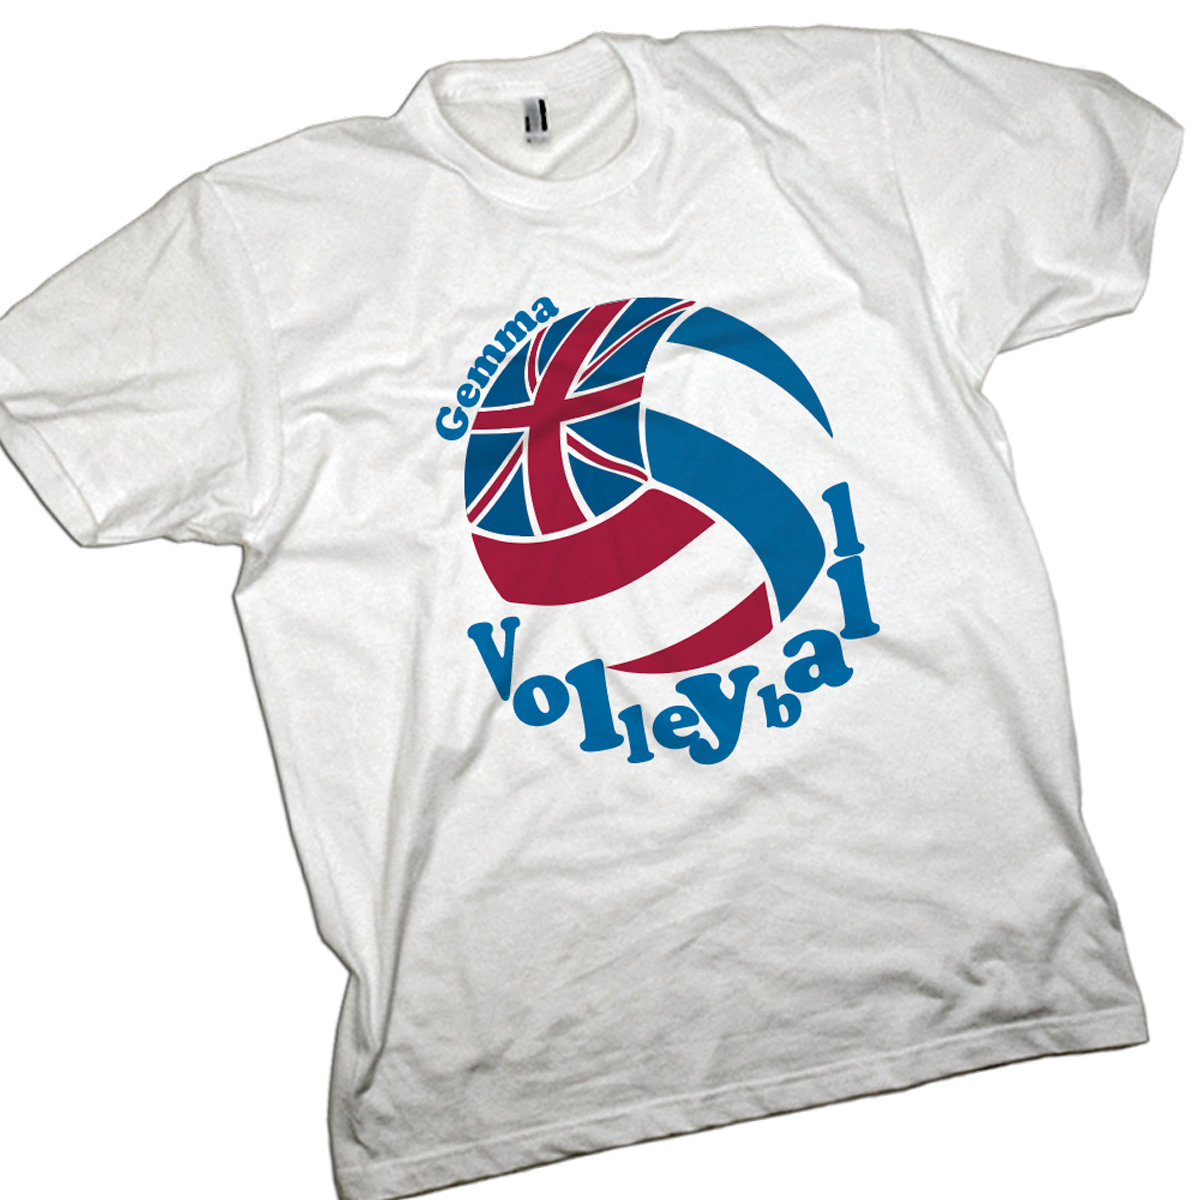 T shirt design volleyball - T Shirt Design Volleyball 60